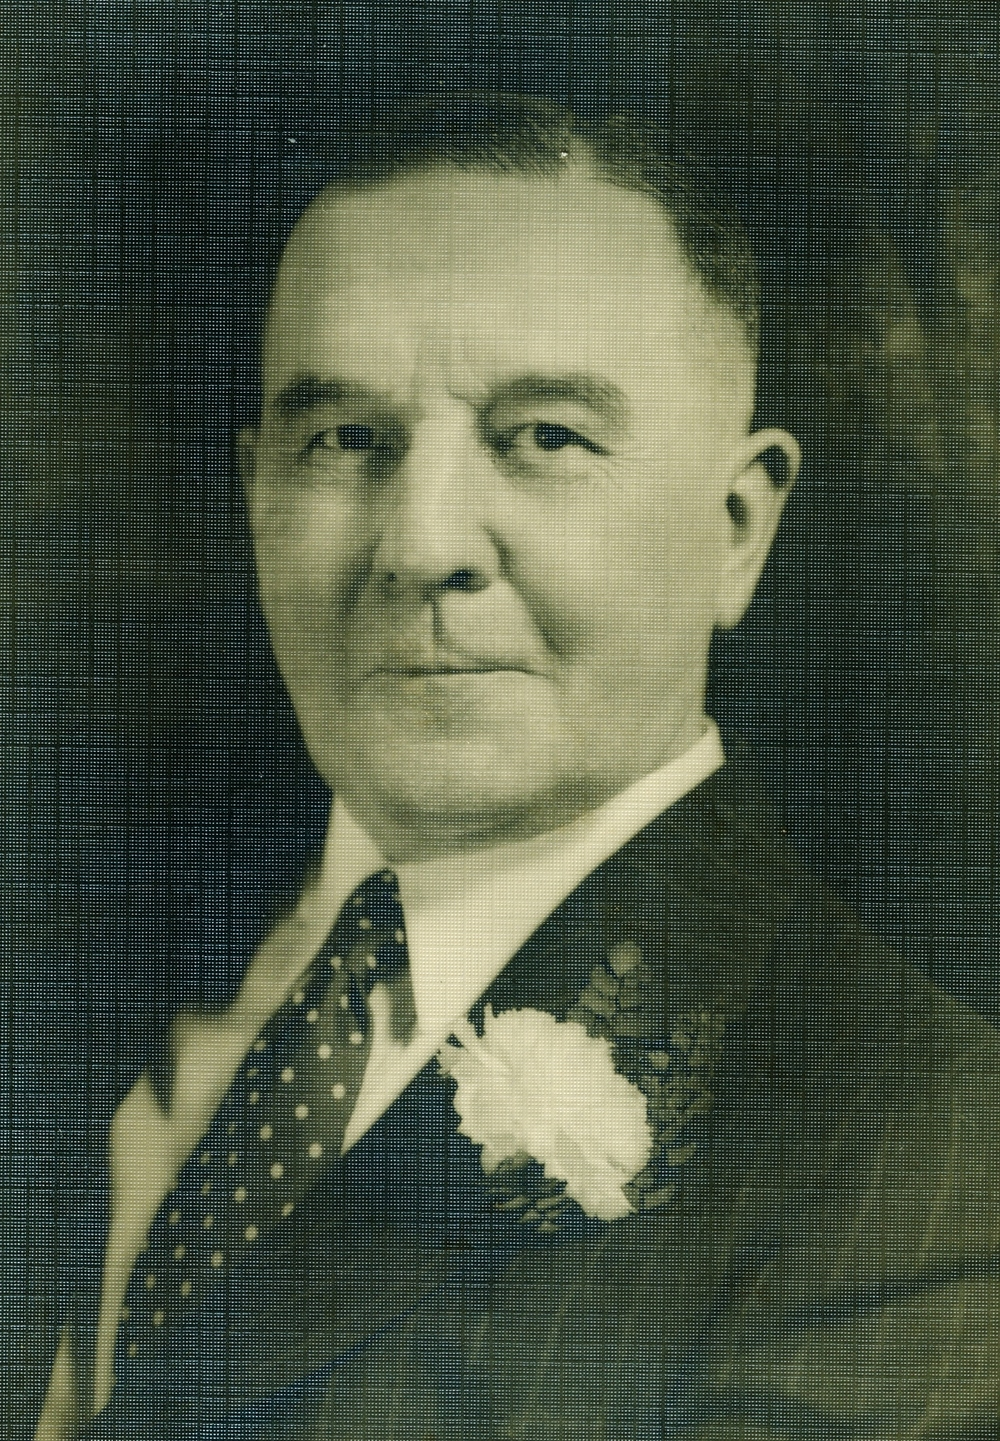 Sidney B. Wright